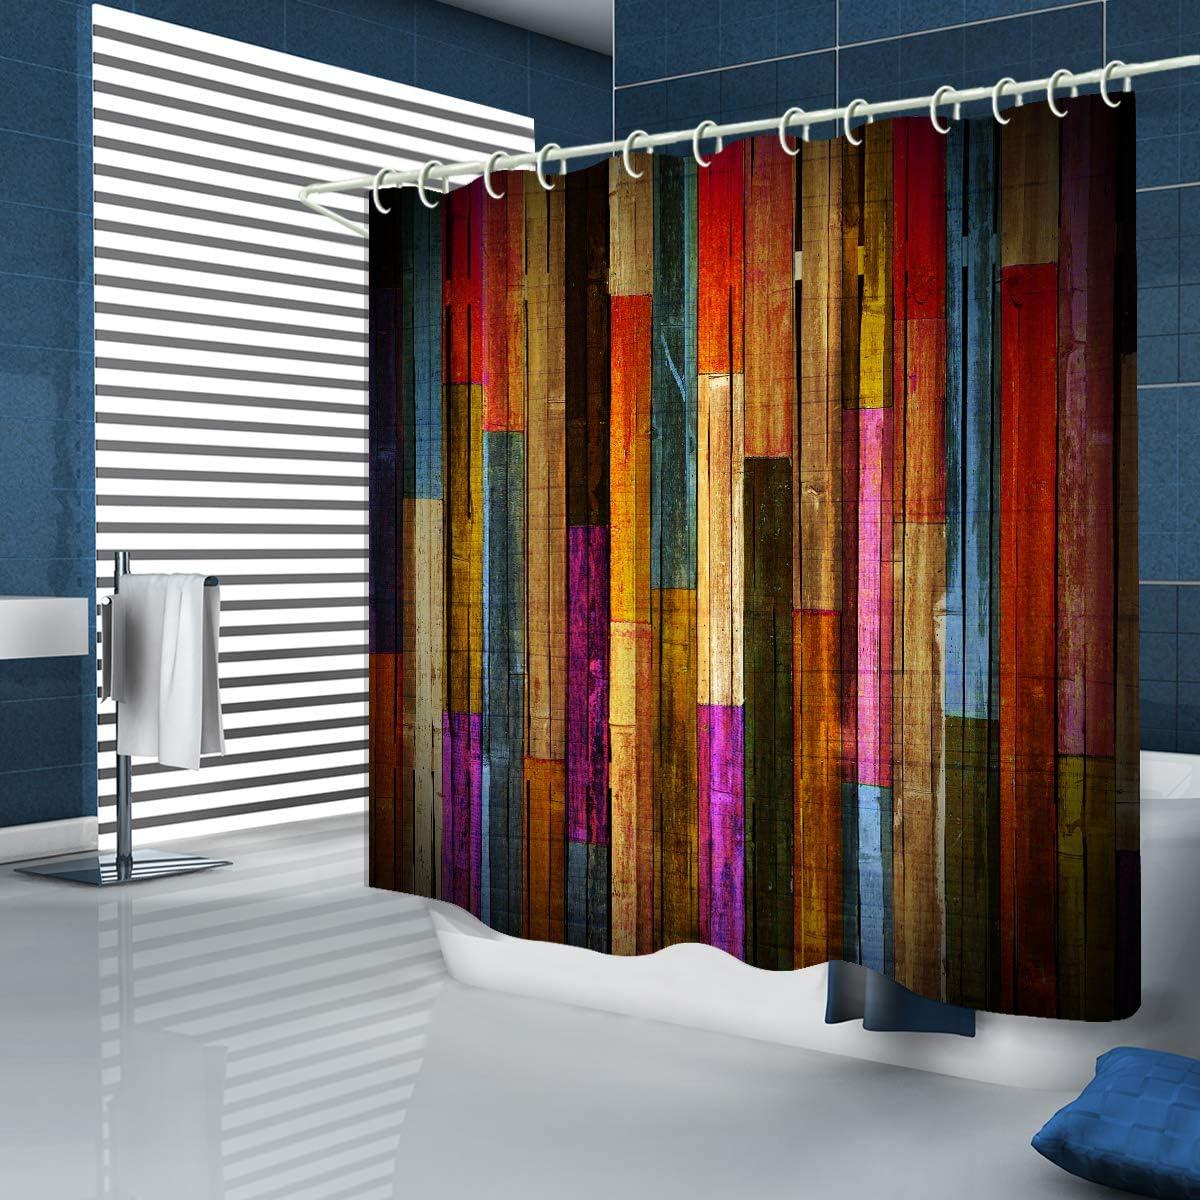 Shower Popular Baltimore Mall standard Curtain Waterproof Polyester for Fabric Bathroom Bathtub